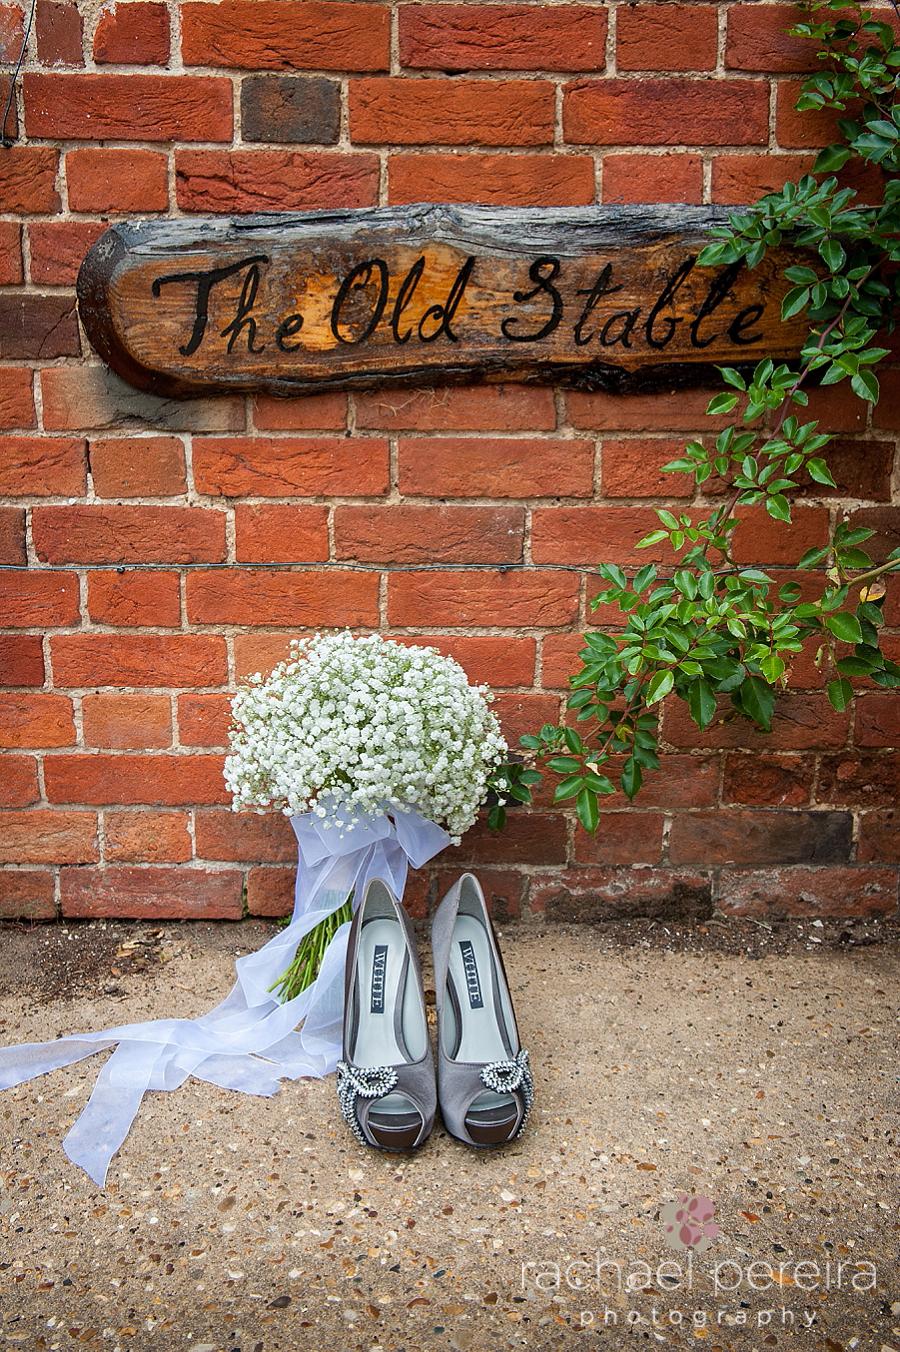 snape-maltings-suffolk-wedding_0011.jpg